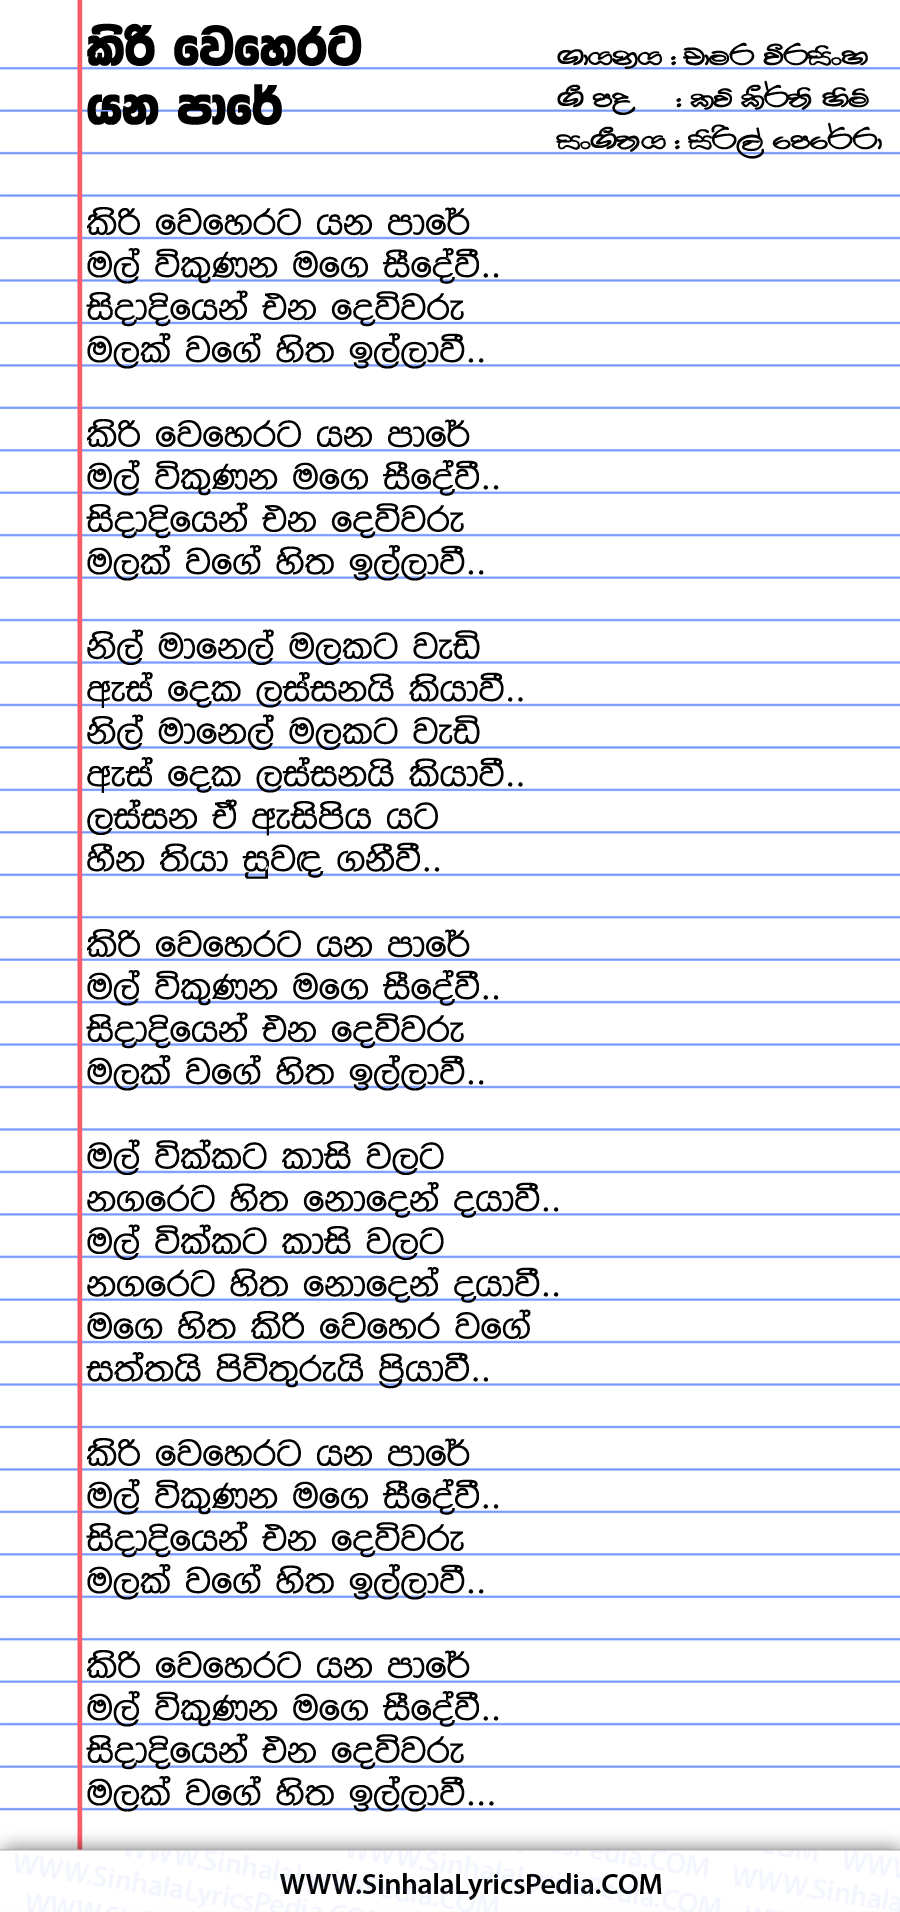 Kiri Weherata Yana Pare Song Lyrics